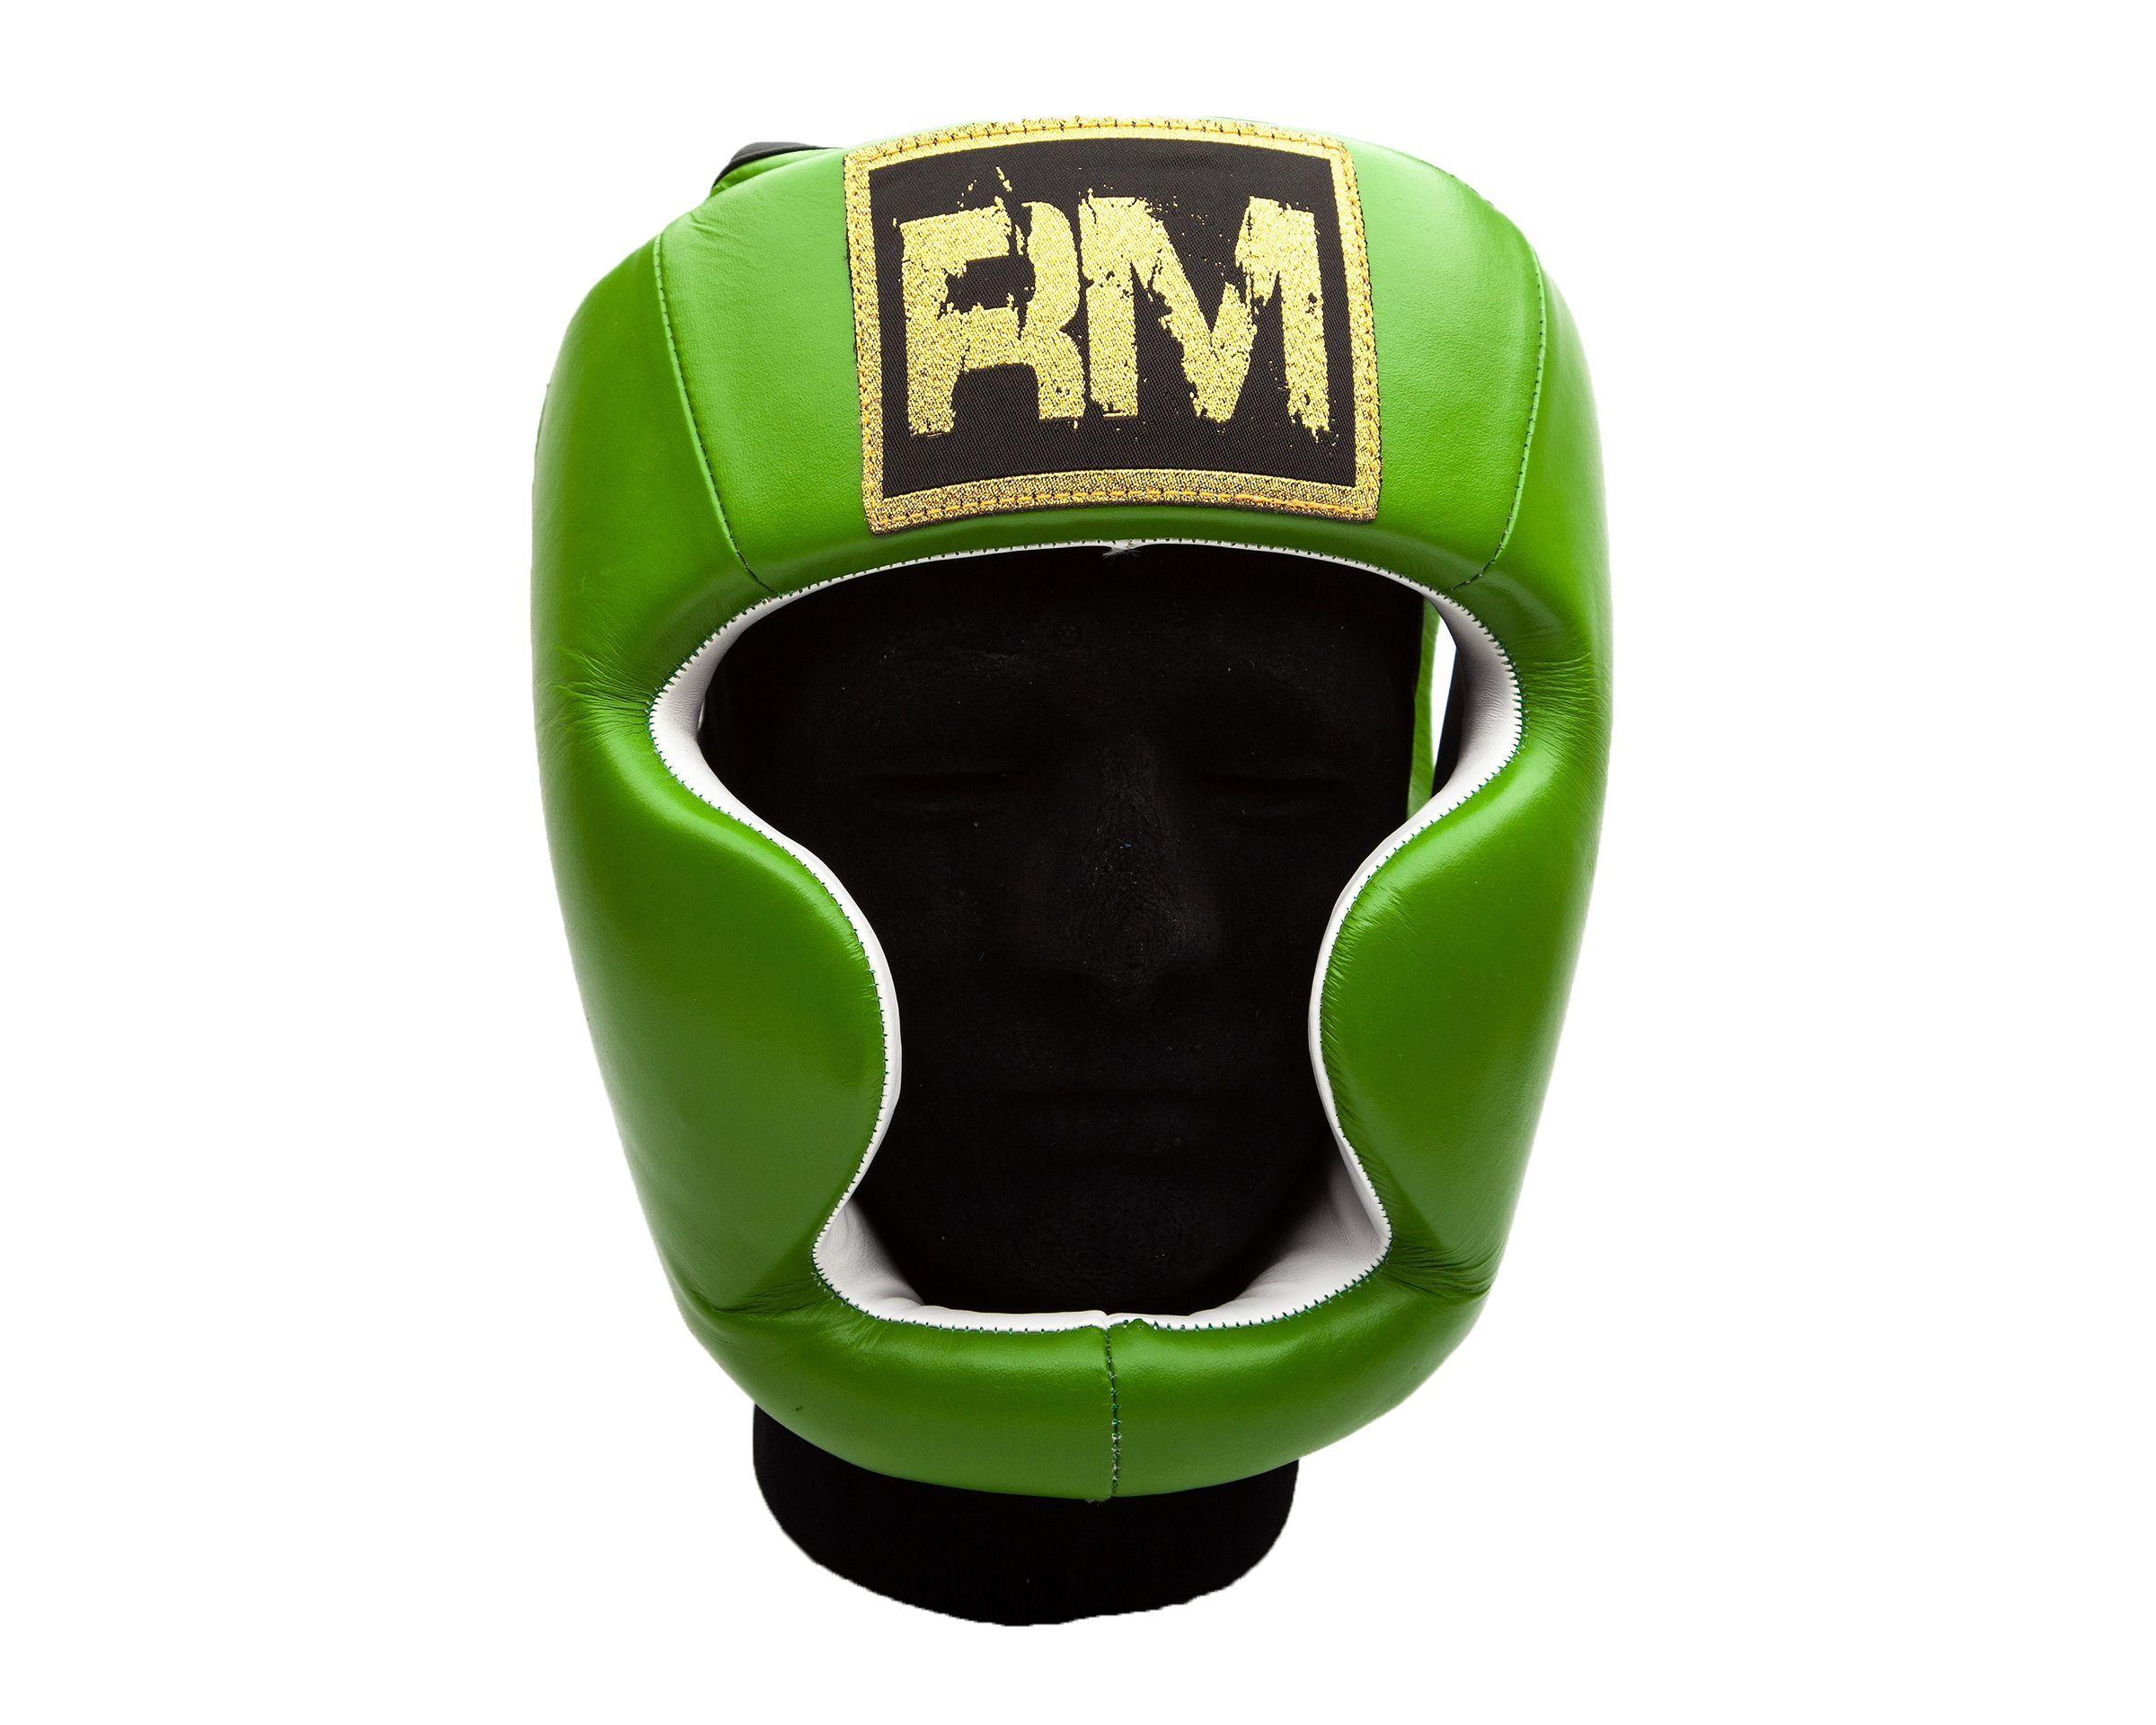 Ringmaster Uk Boxing Headguard Genuine Leather Green Boxing Equipment Mma Training Equipment Leather